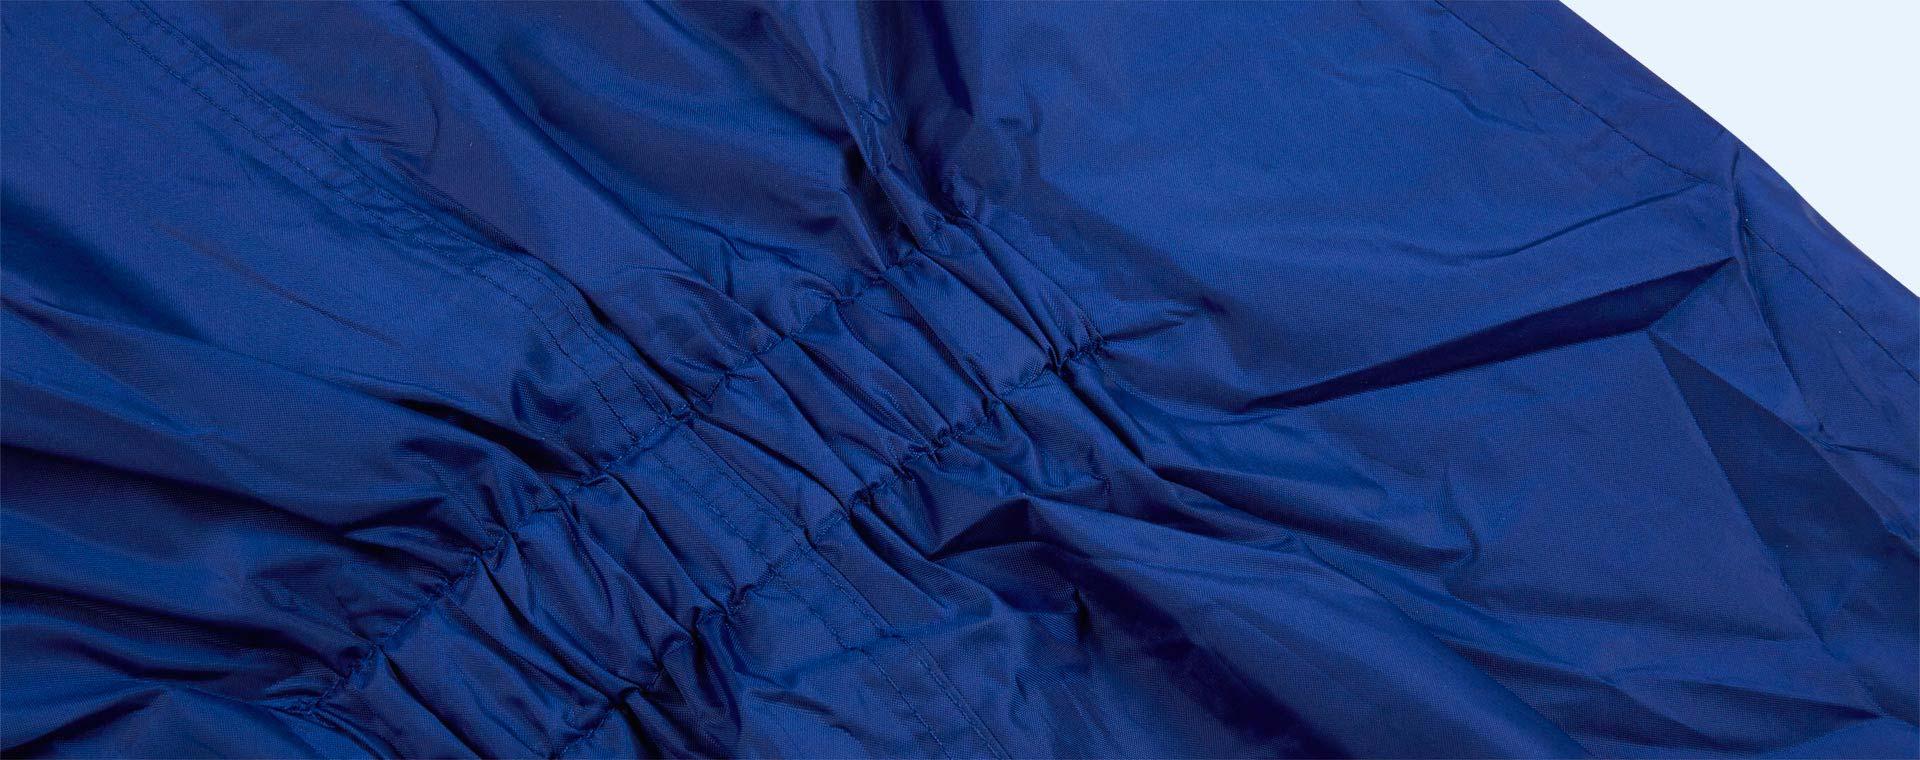 Blue Hippychick Packasuit Waterproof All-In-One